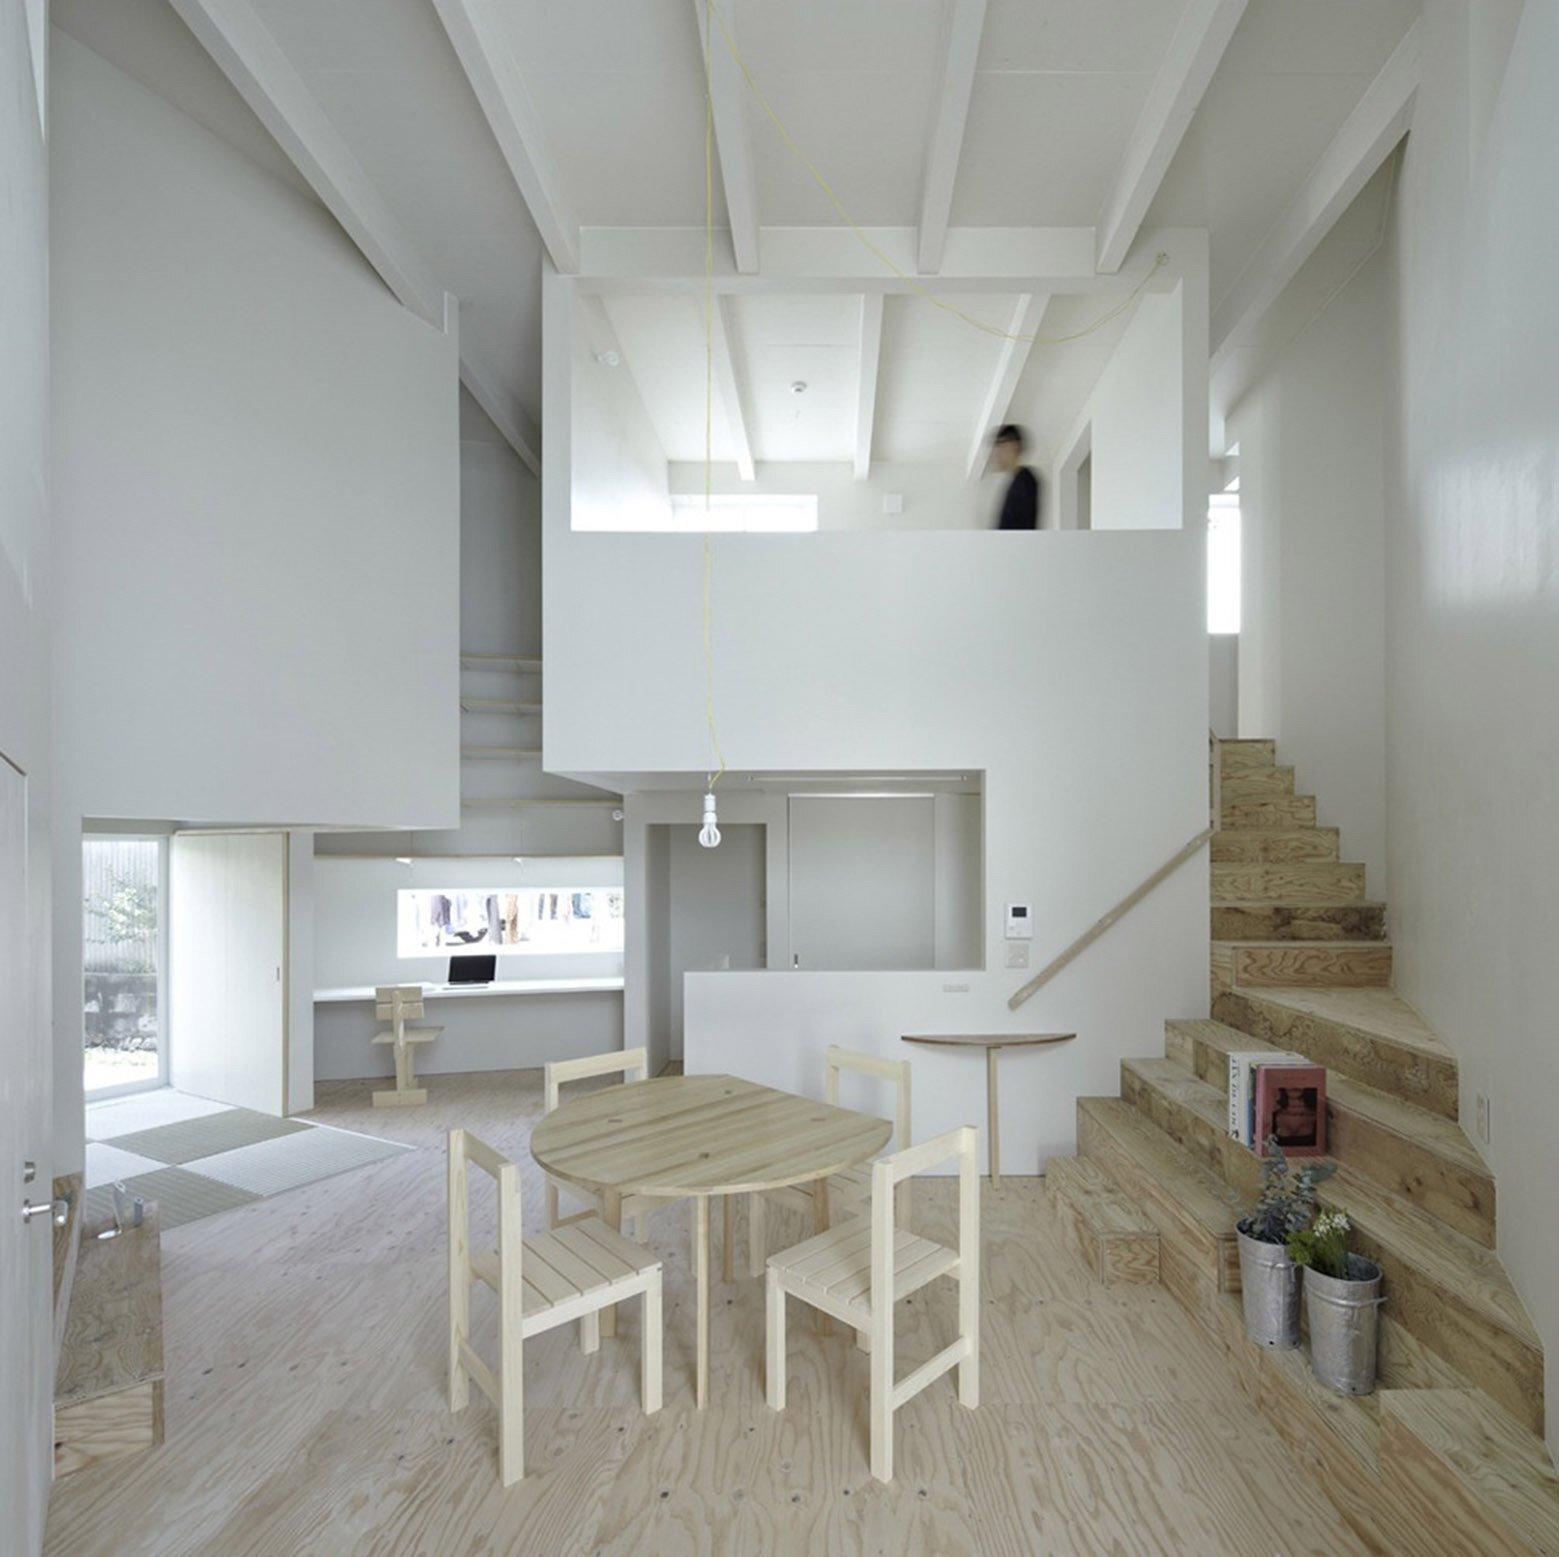 House In Iizuka - Japanese House - Rhythmdesign - Living Area - Humble Homes